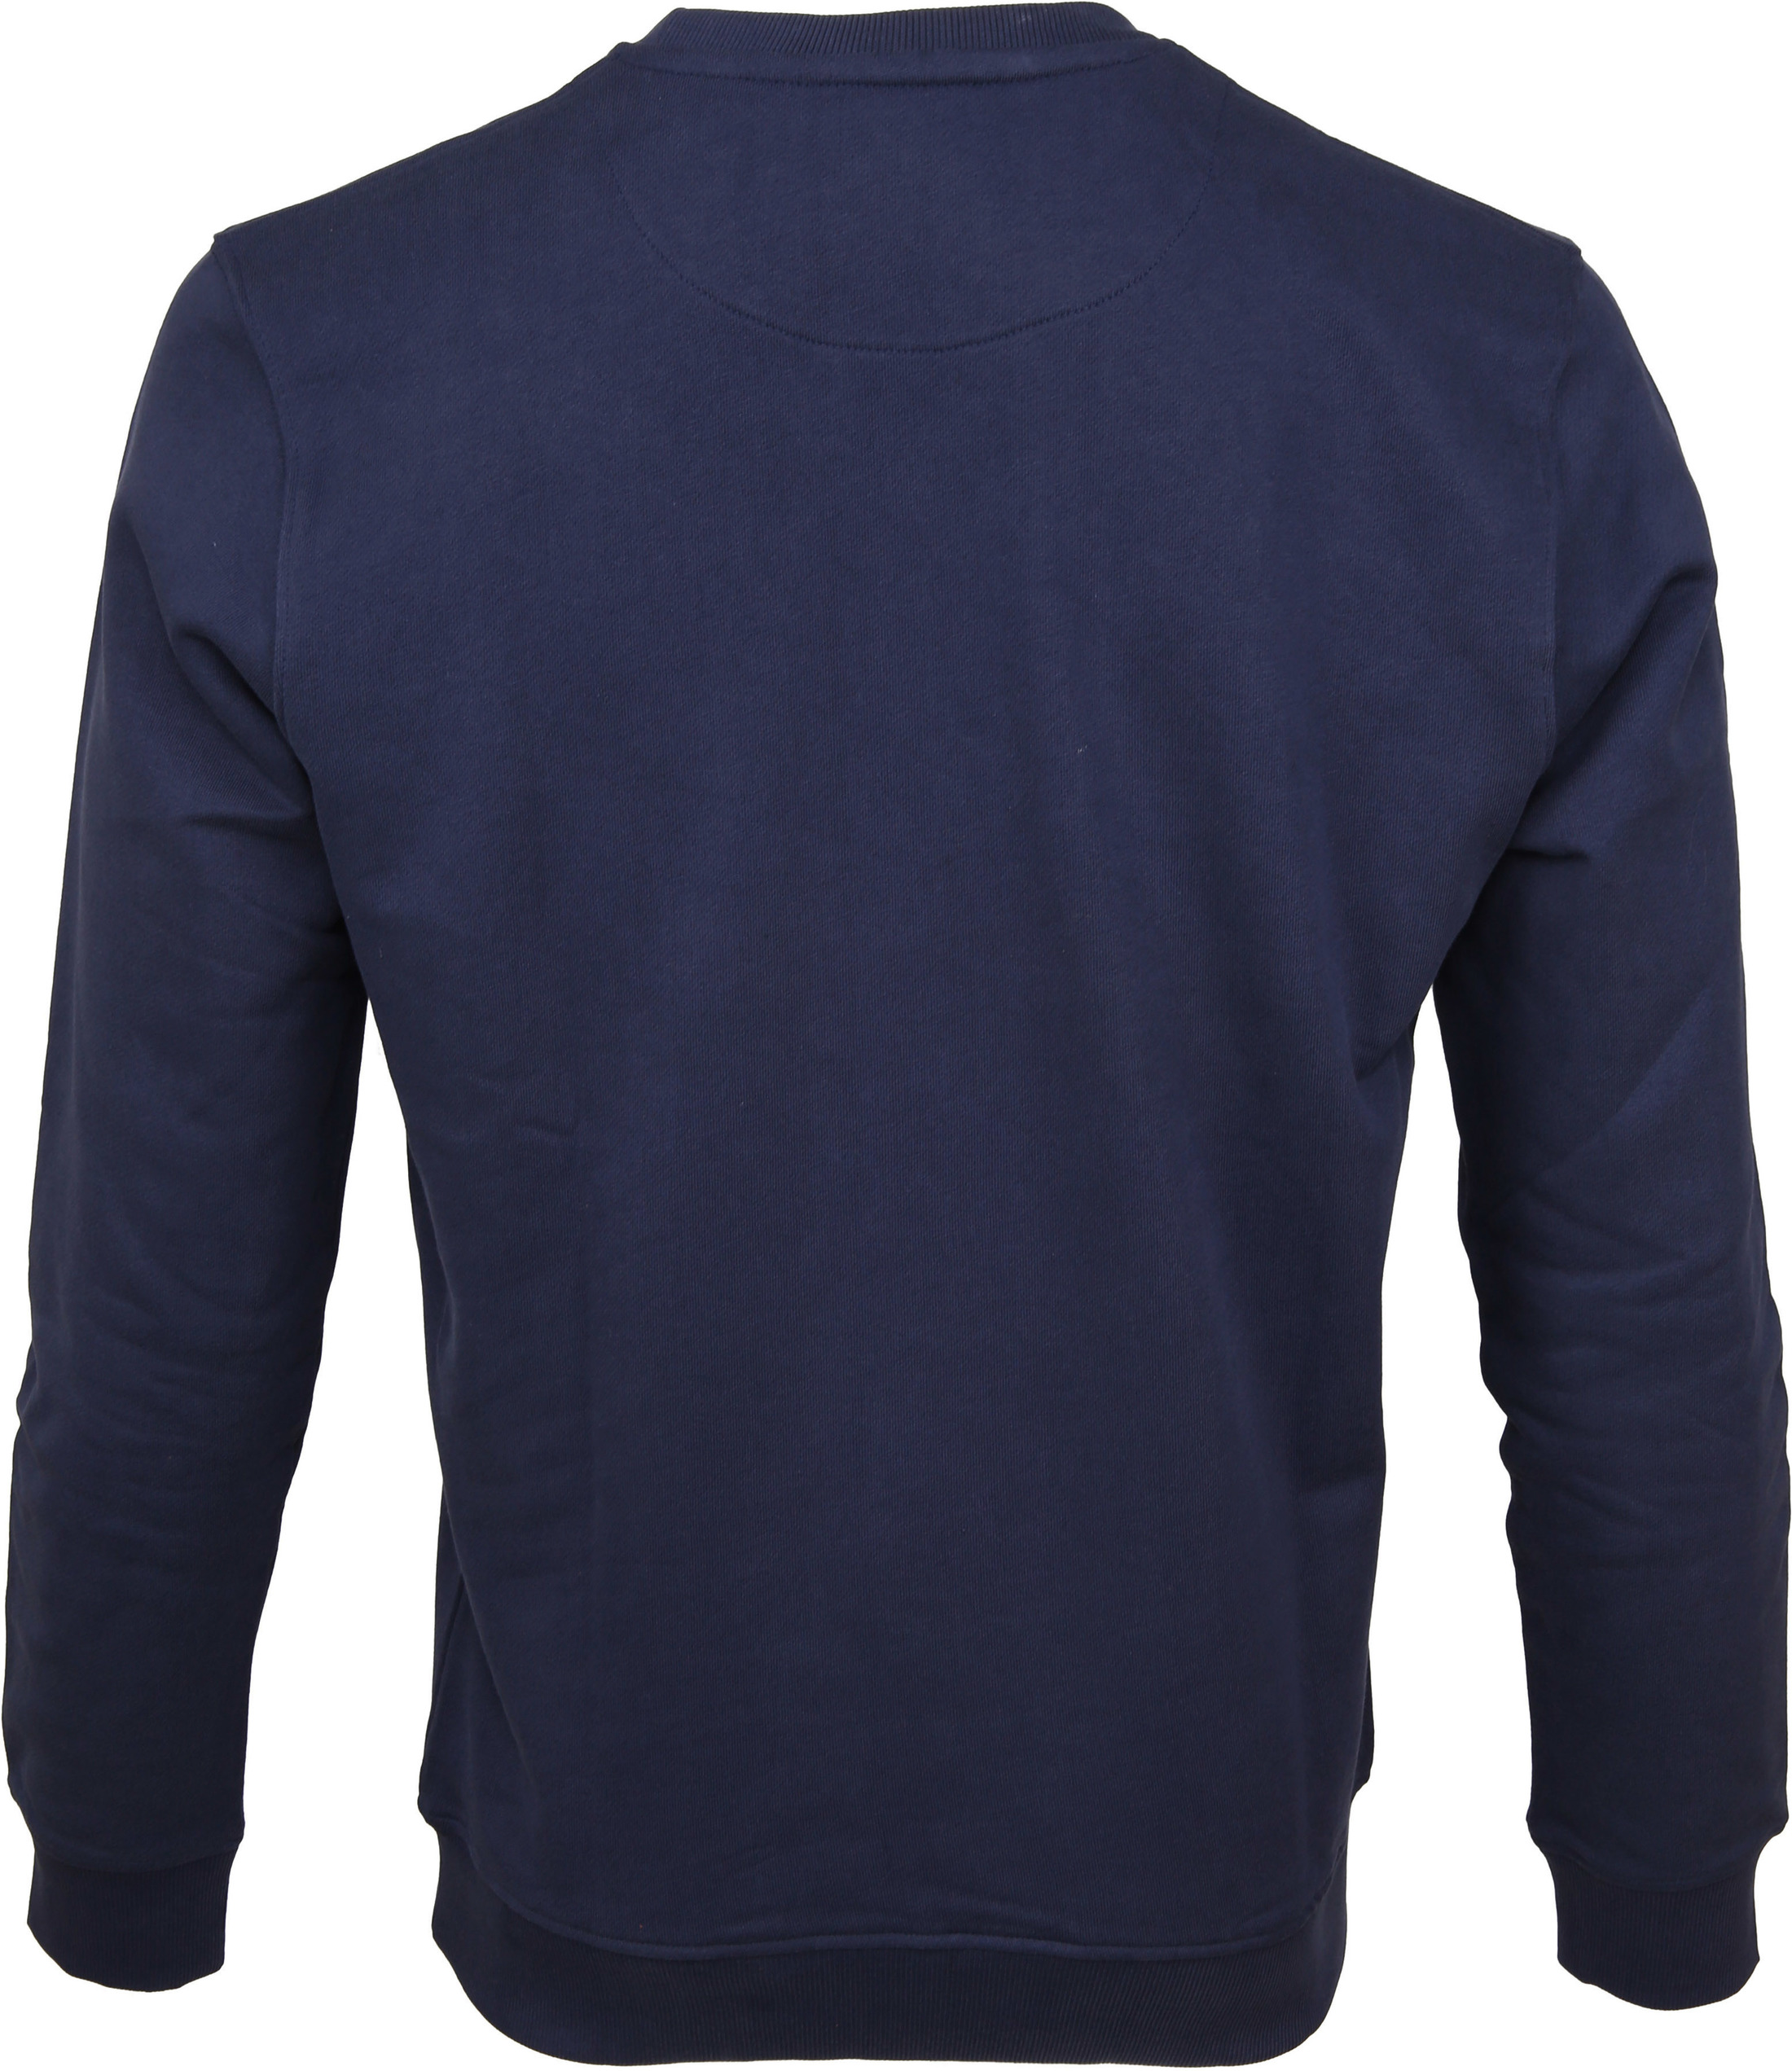 Suitable Sweater Chest Dunkelblau foto 2